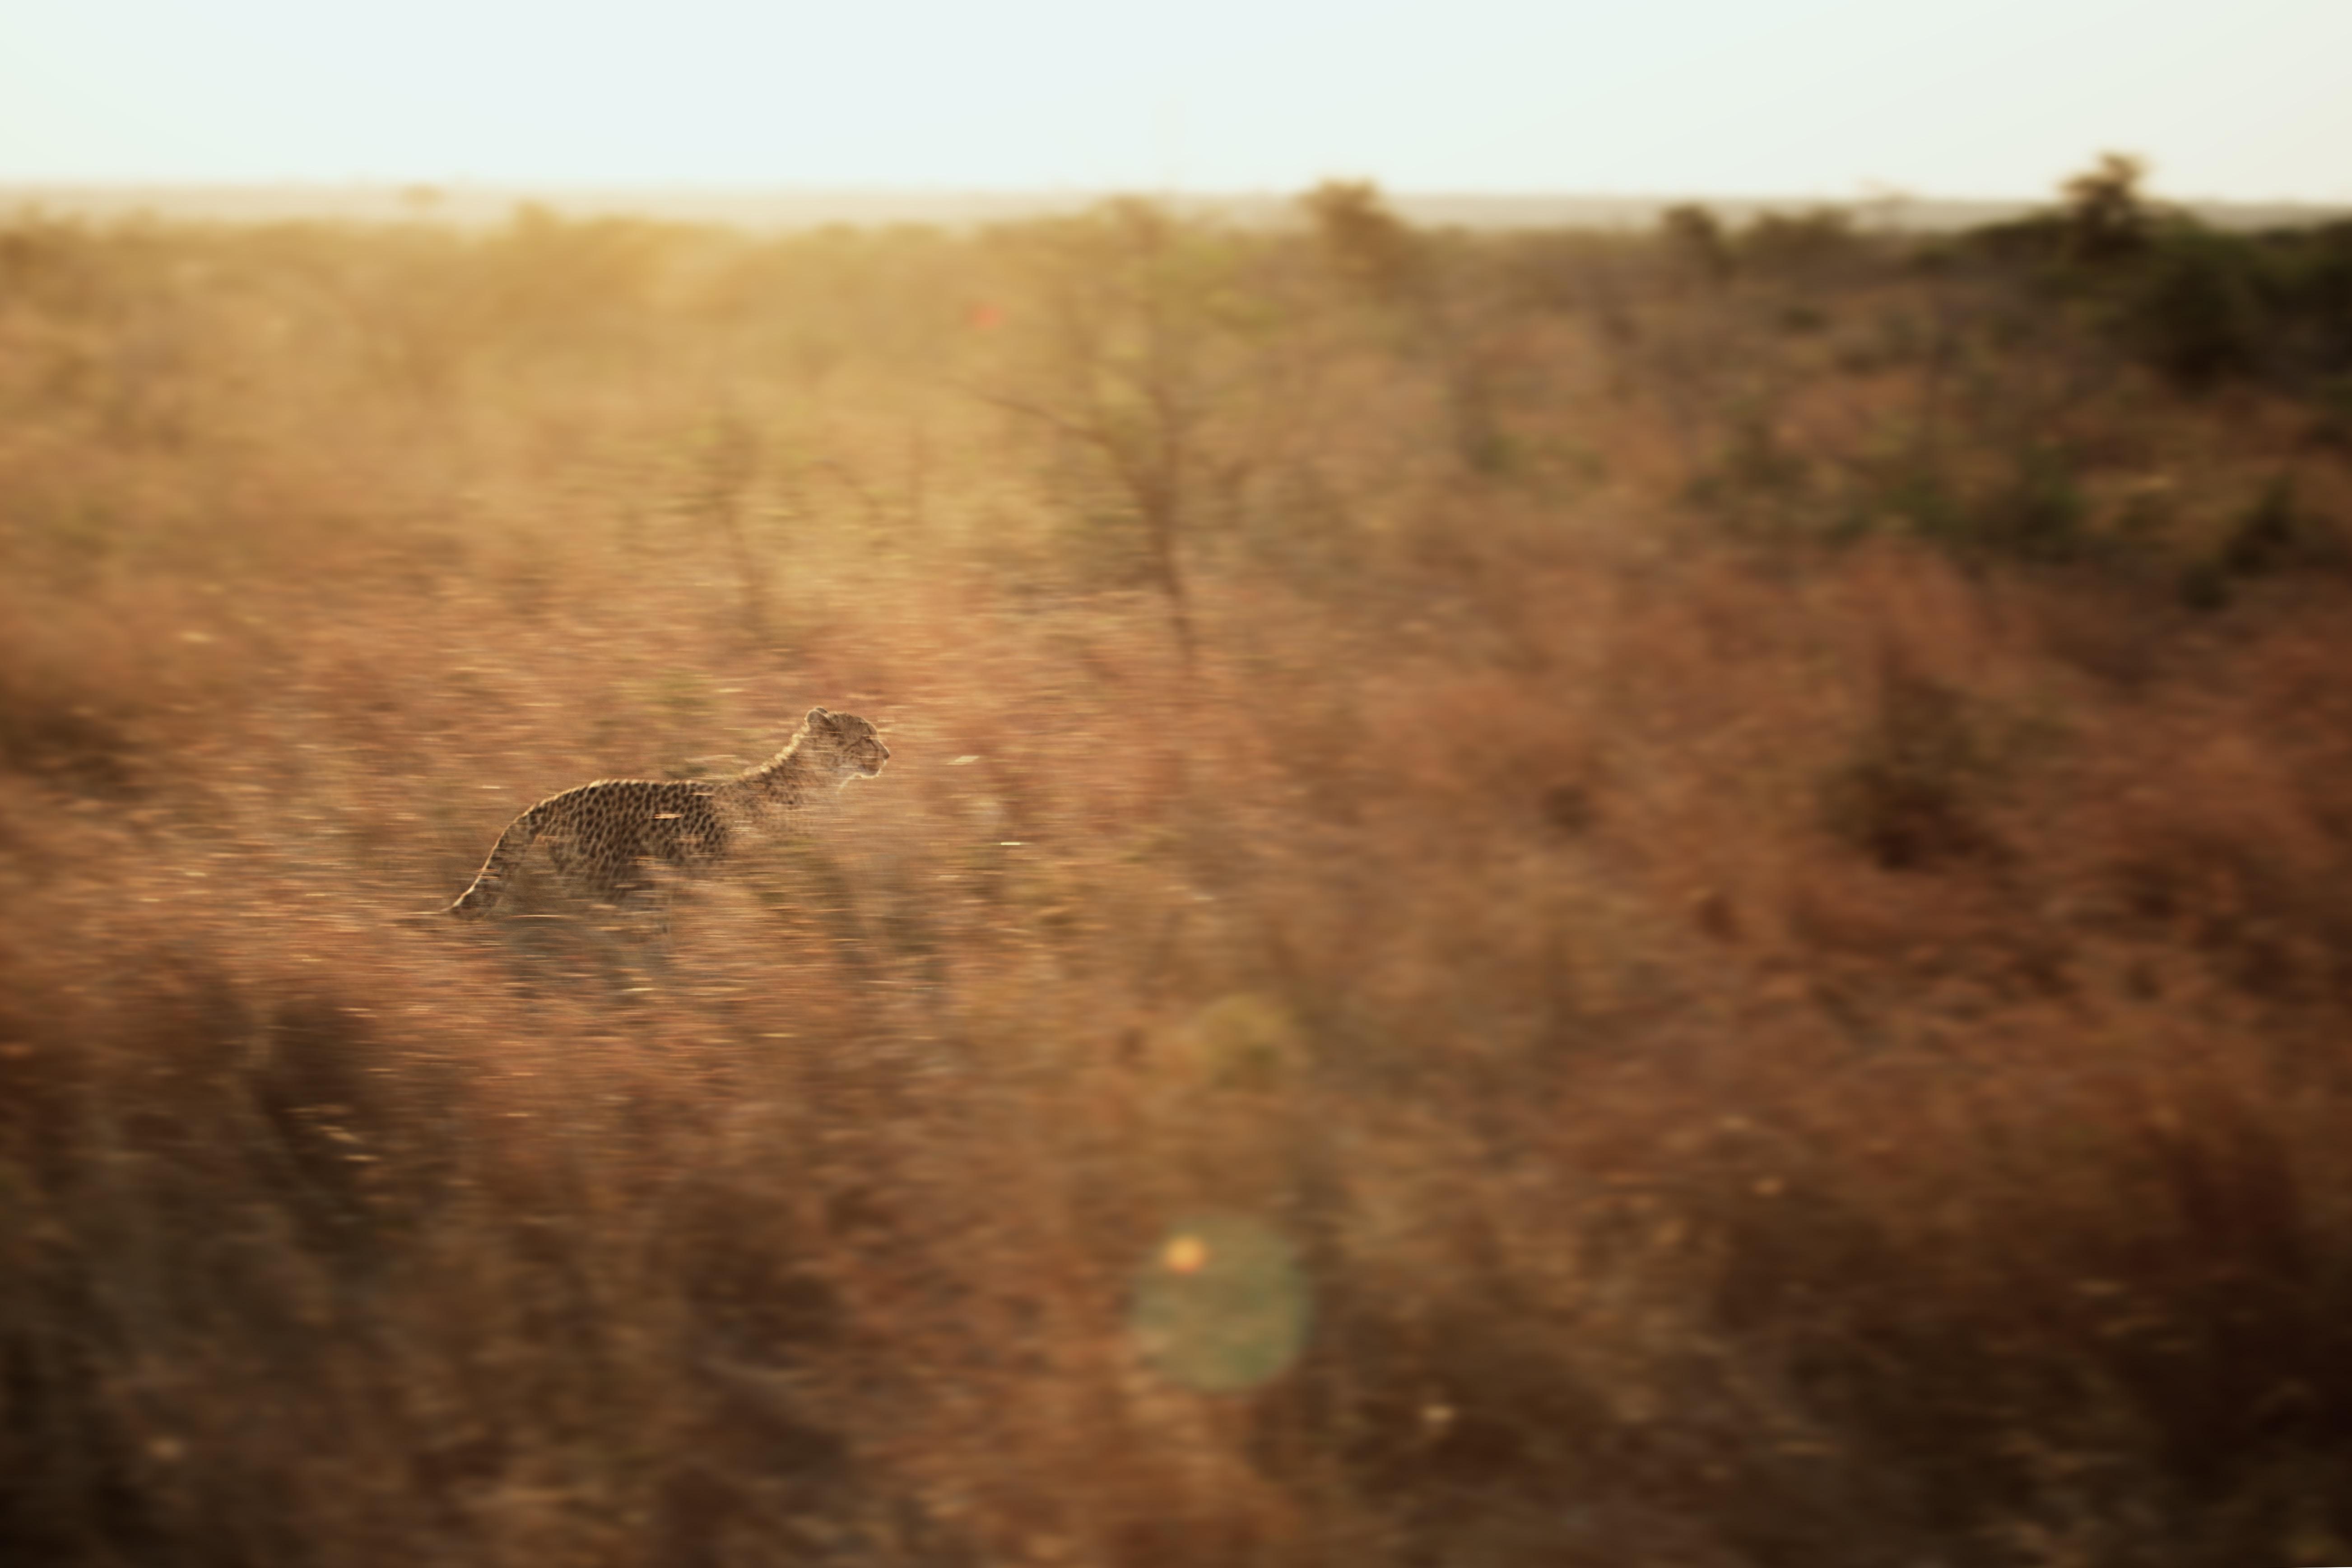 brown animal running on green grass field